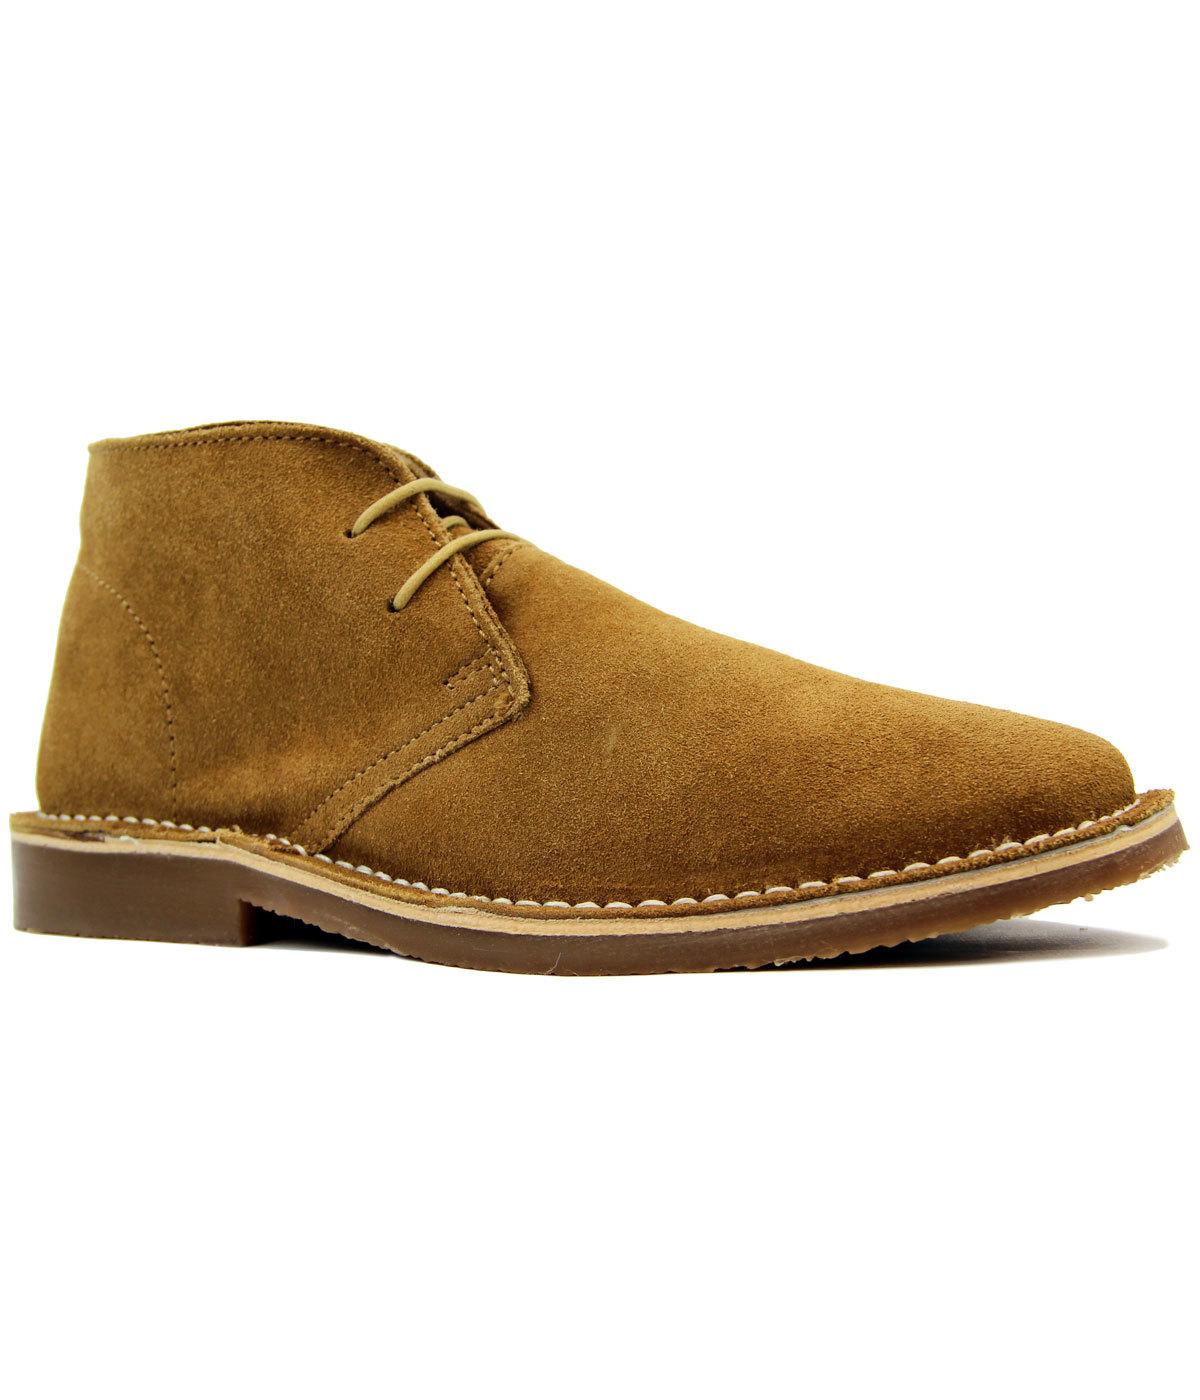 madcap england daltrey 60s mod suede desert boots